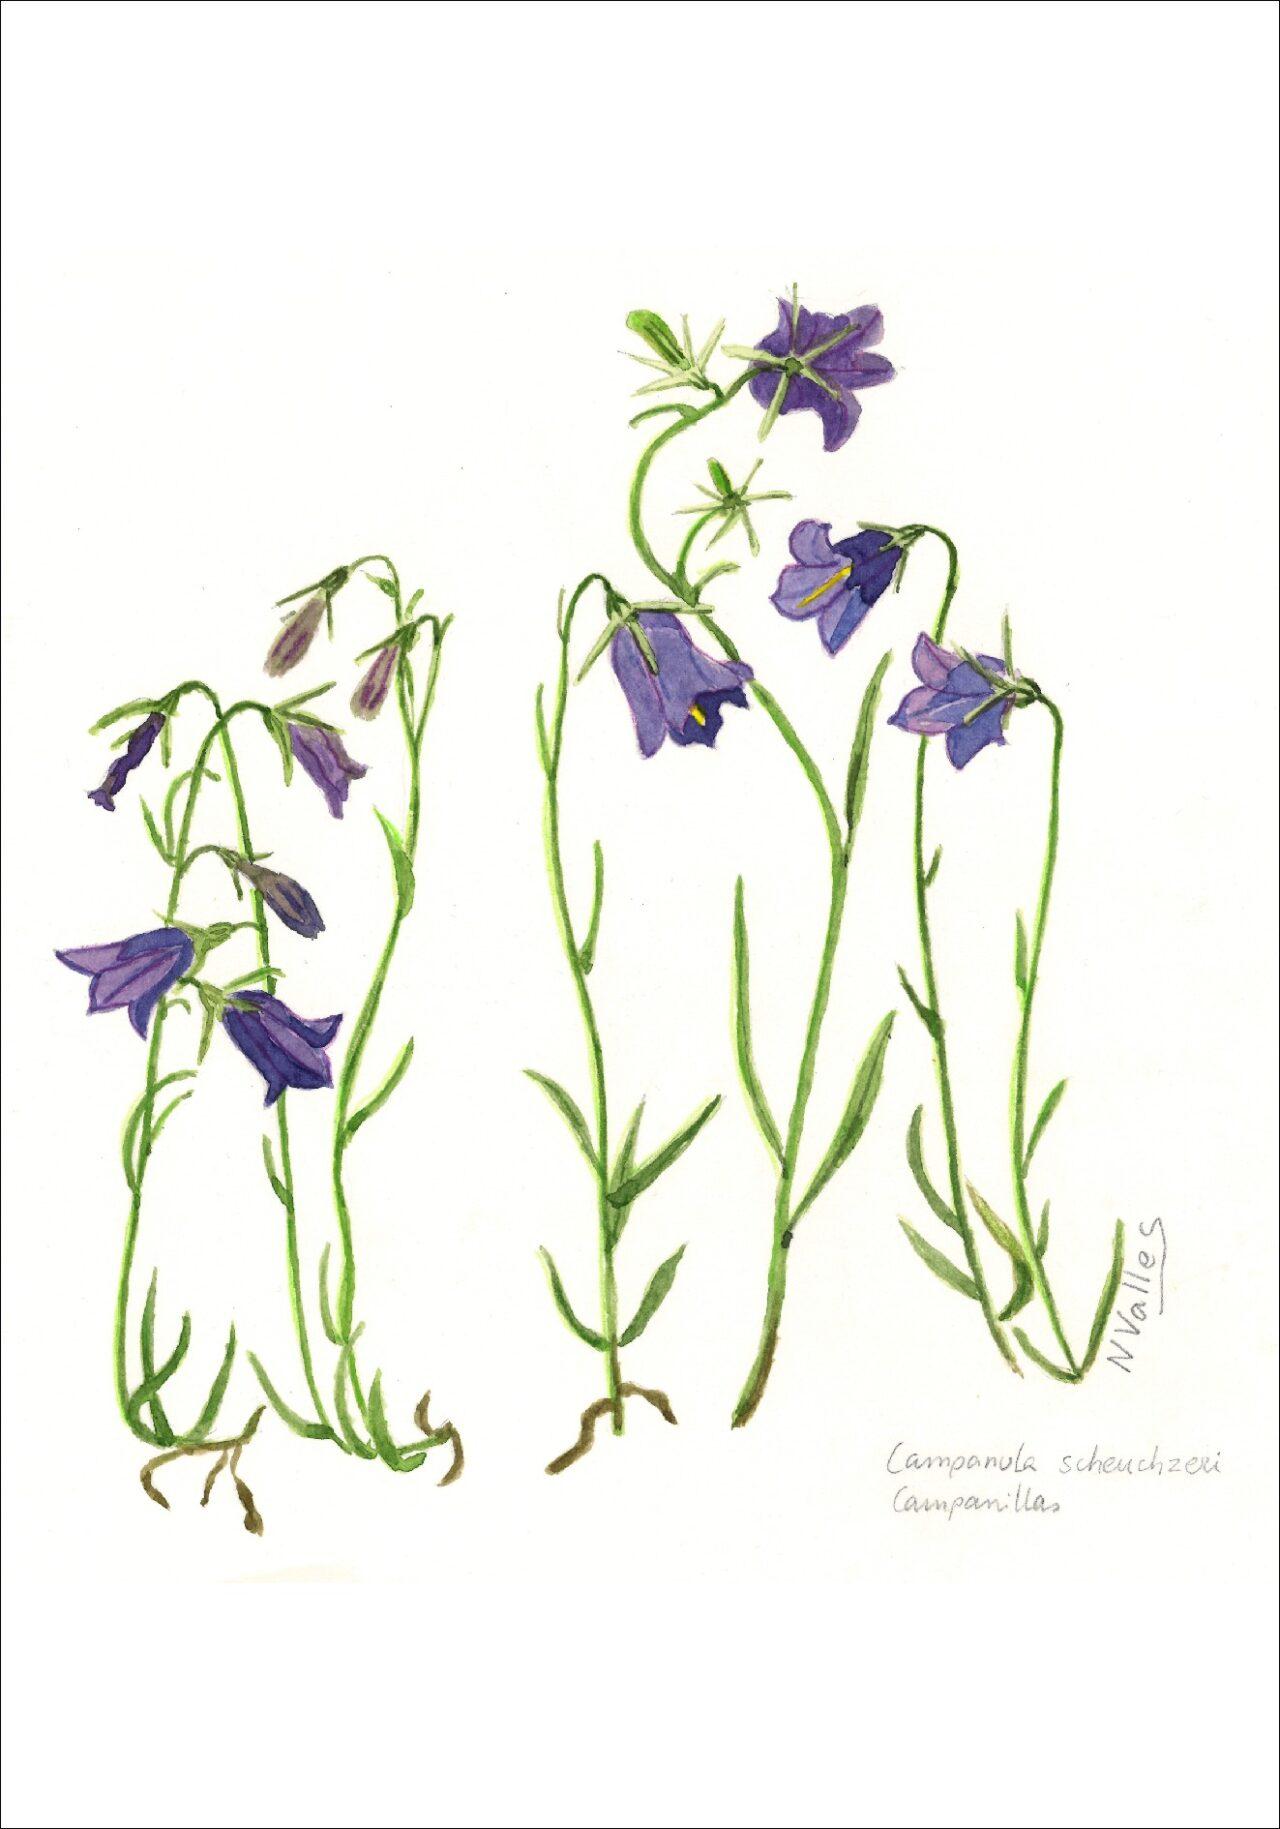 Campanula scheuchzeri Campanetes - Campanillas - Bellflower